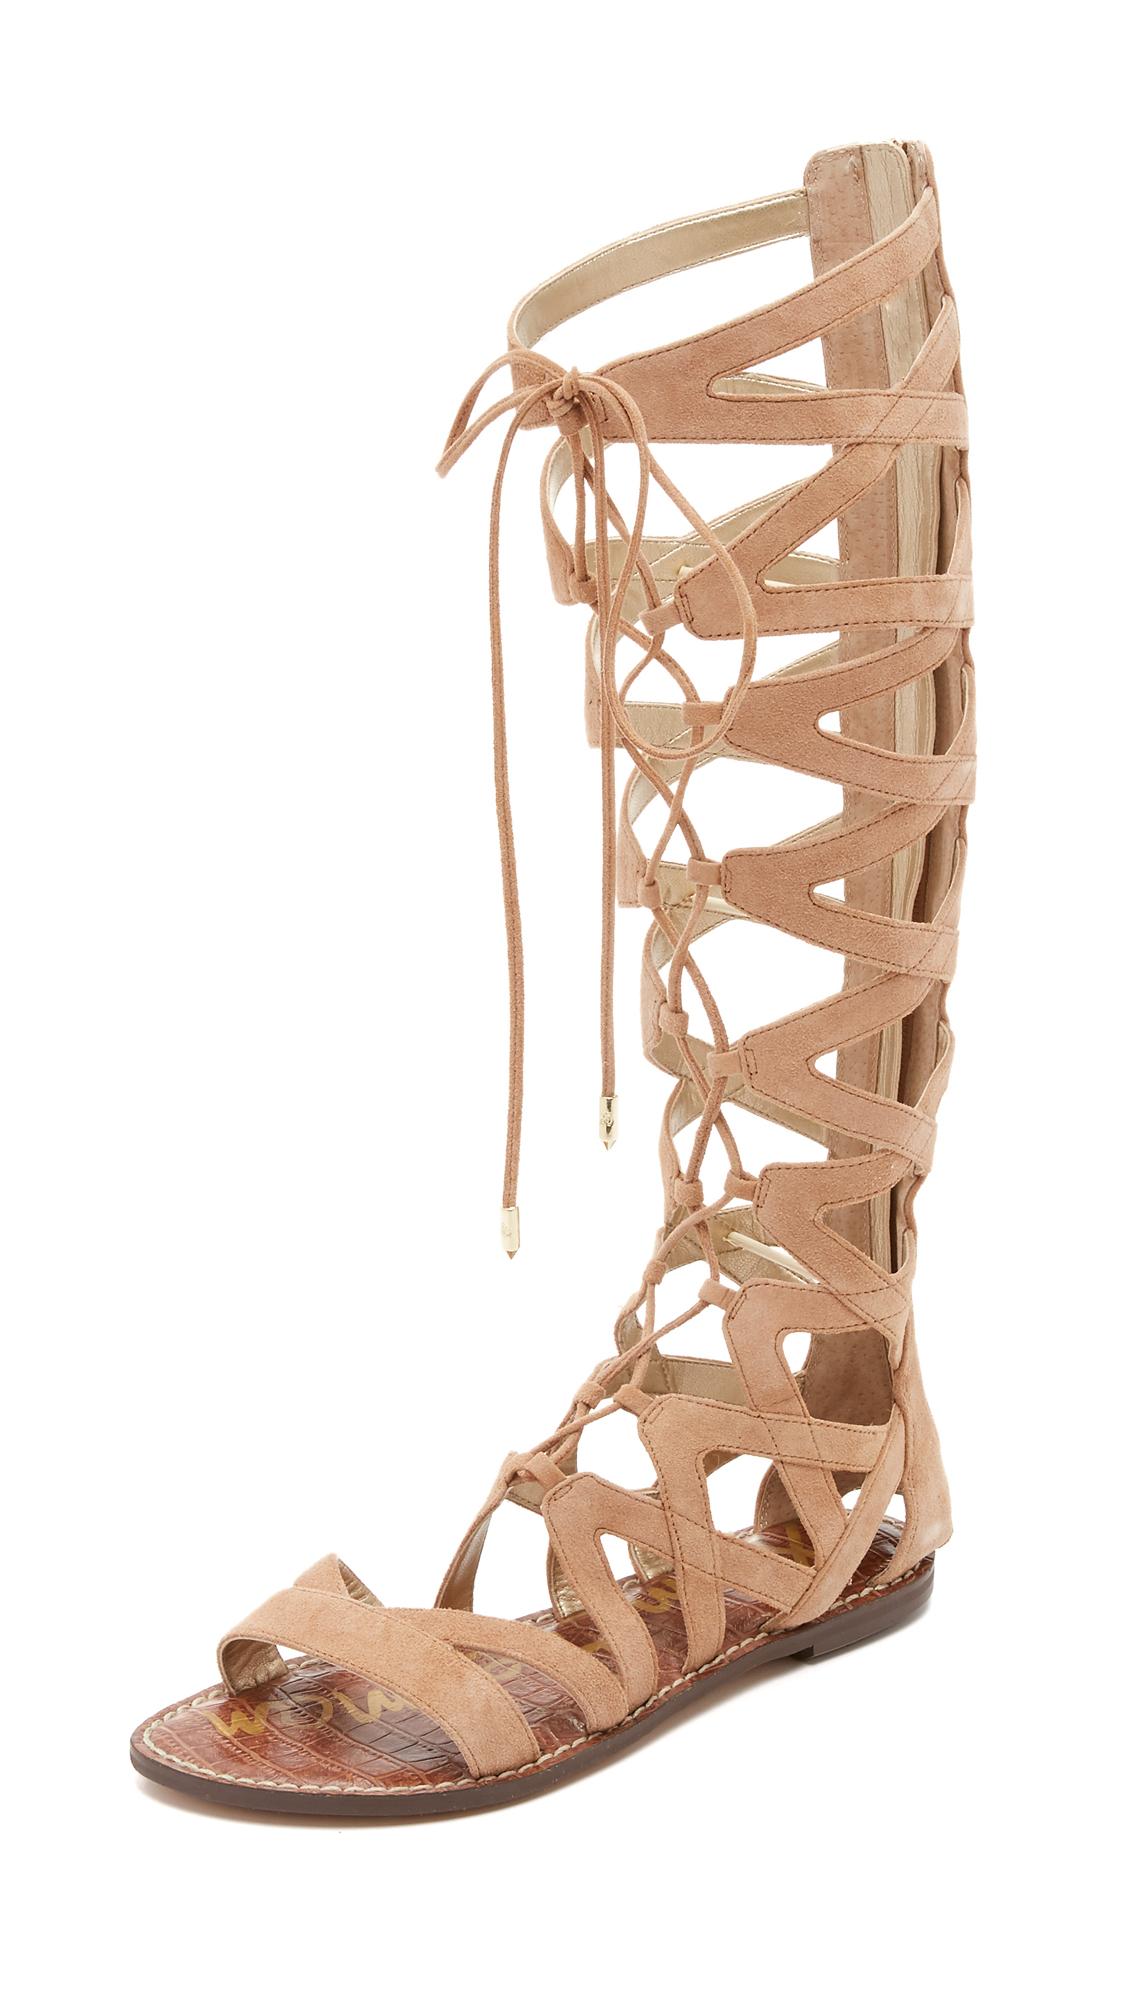 791d52c528dd Sam Edelman Gena Tall Gladiator Sandals on PopScreen